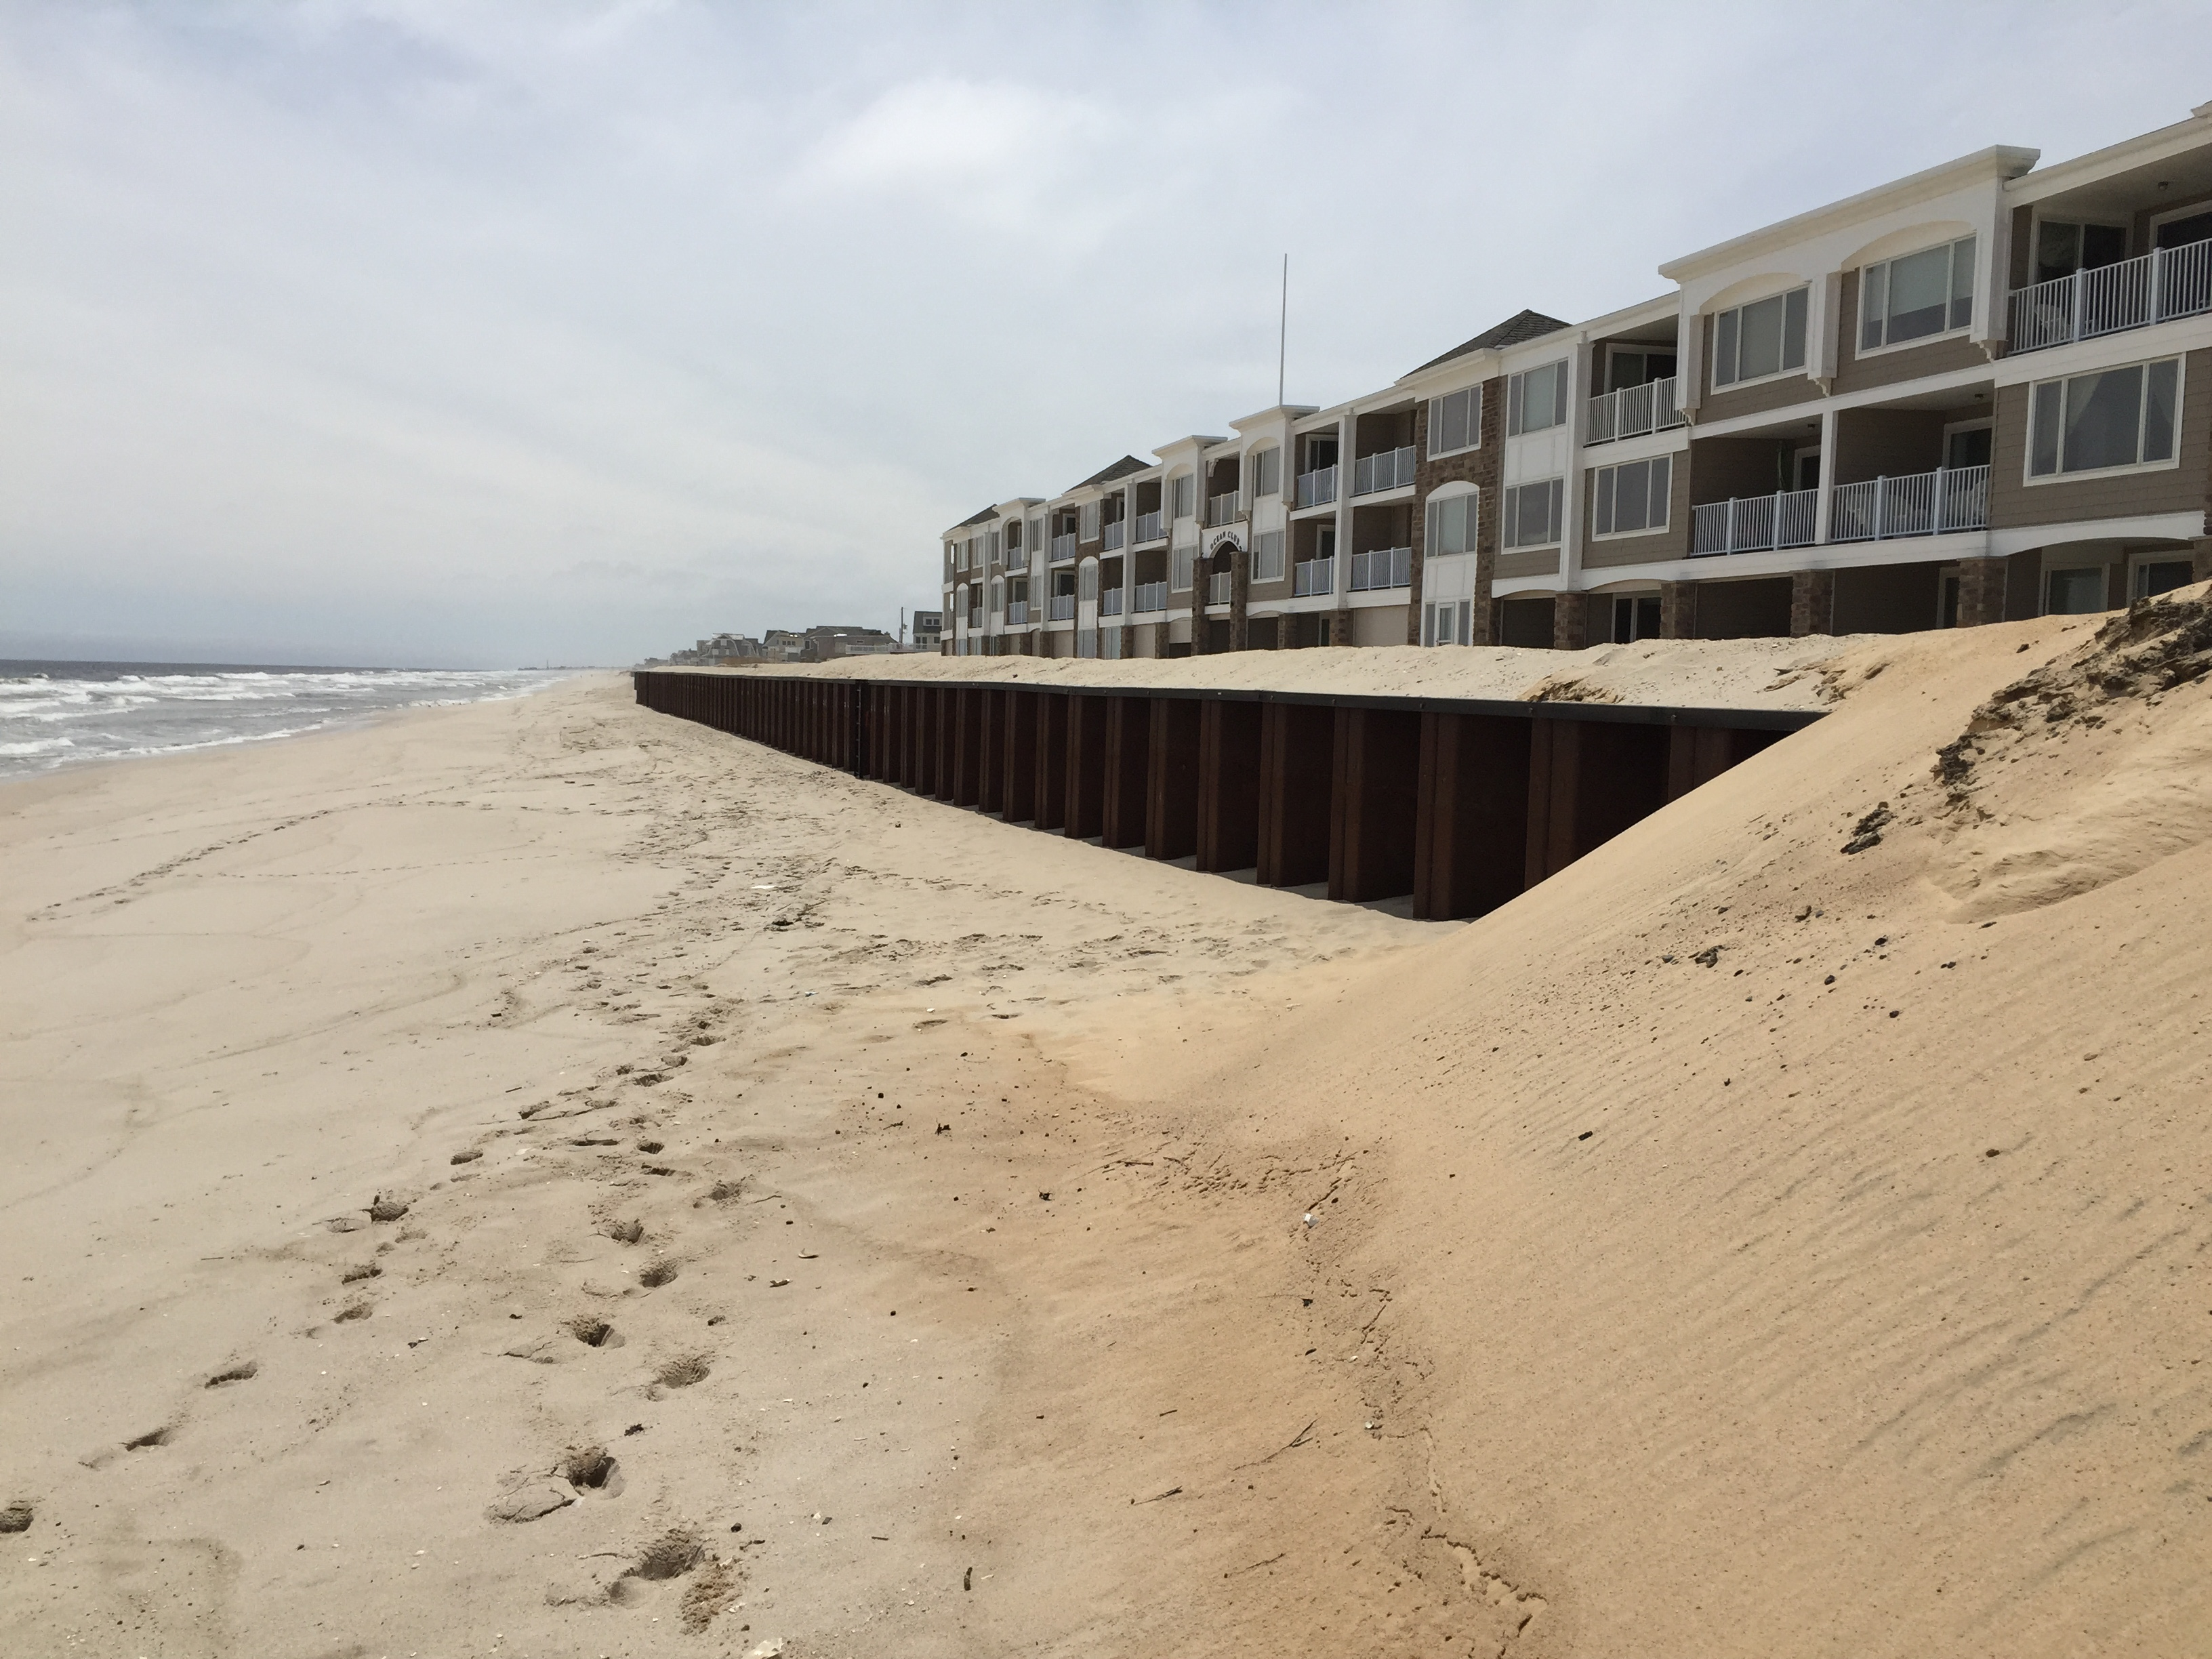 An up to six foot drop near the steel wall revetment at Brick Beach III. (Photo: Daniel Nee)